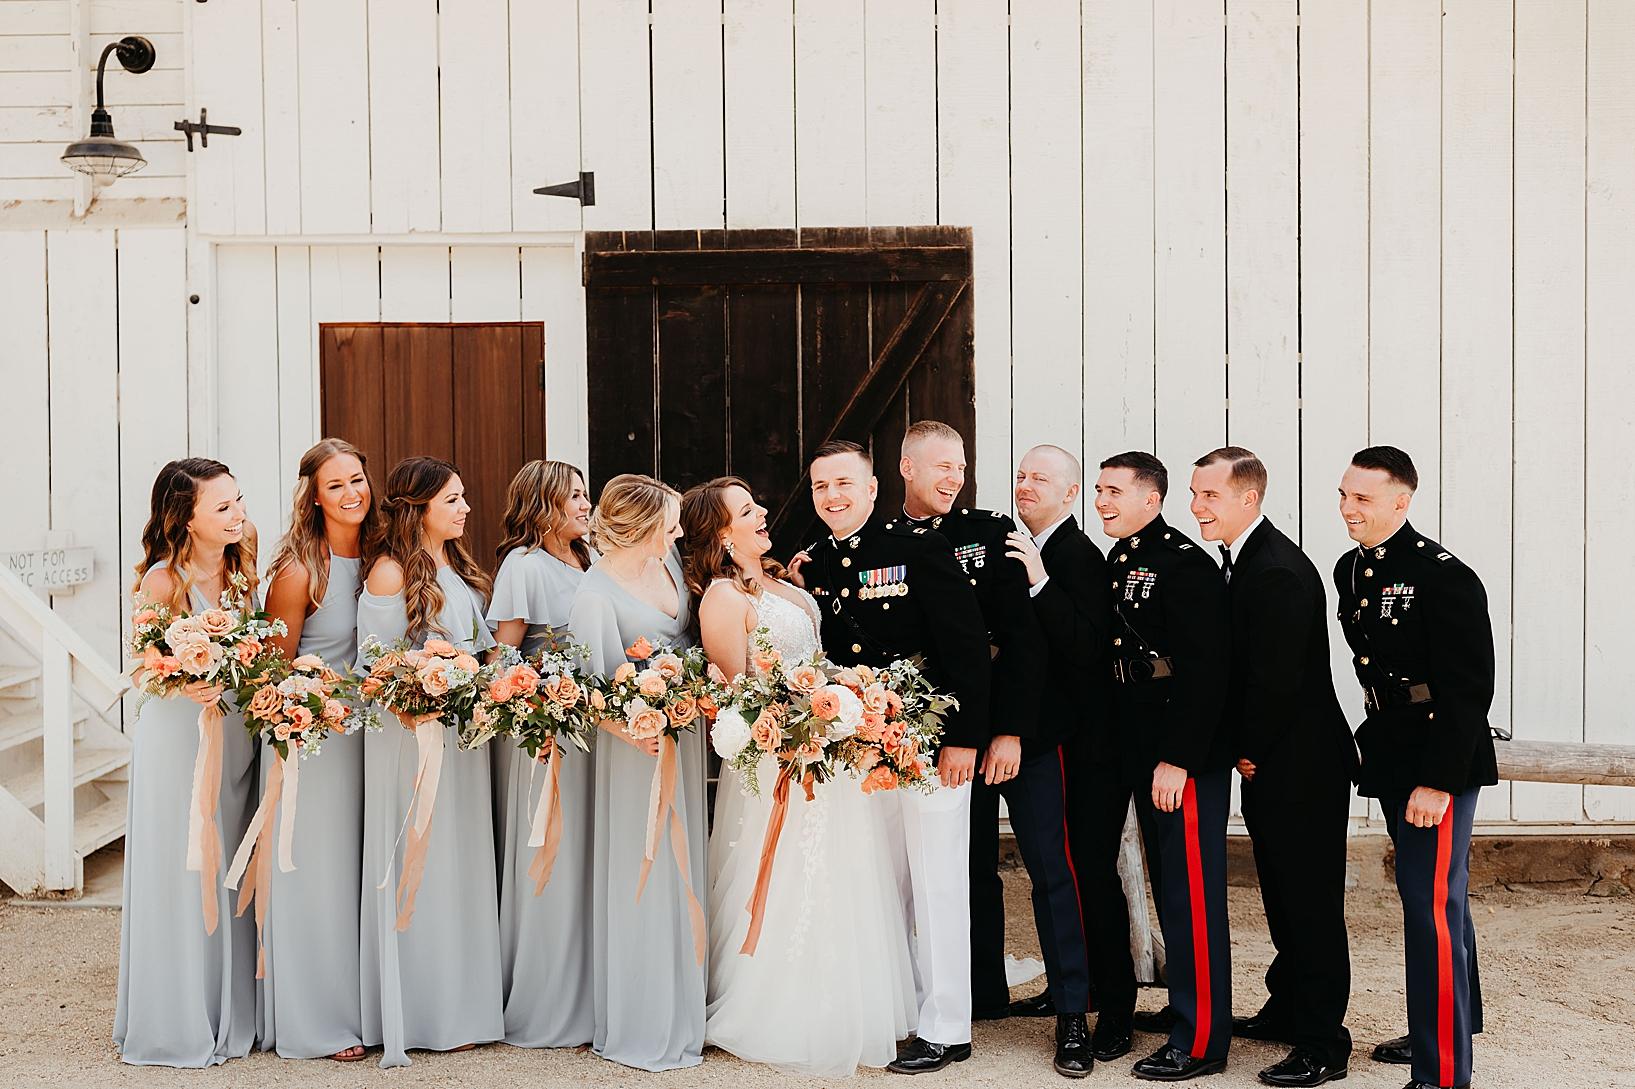 Leo-Carrillo-Ranch-Wedding-37.jpg